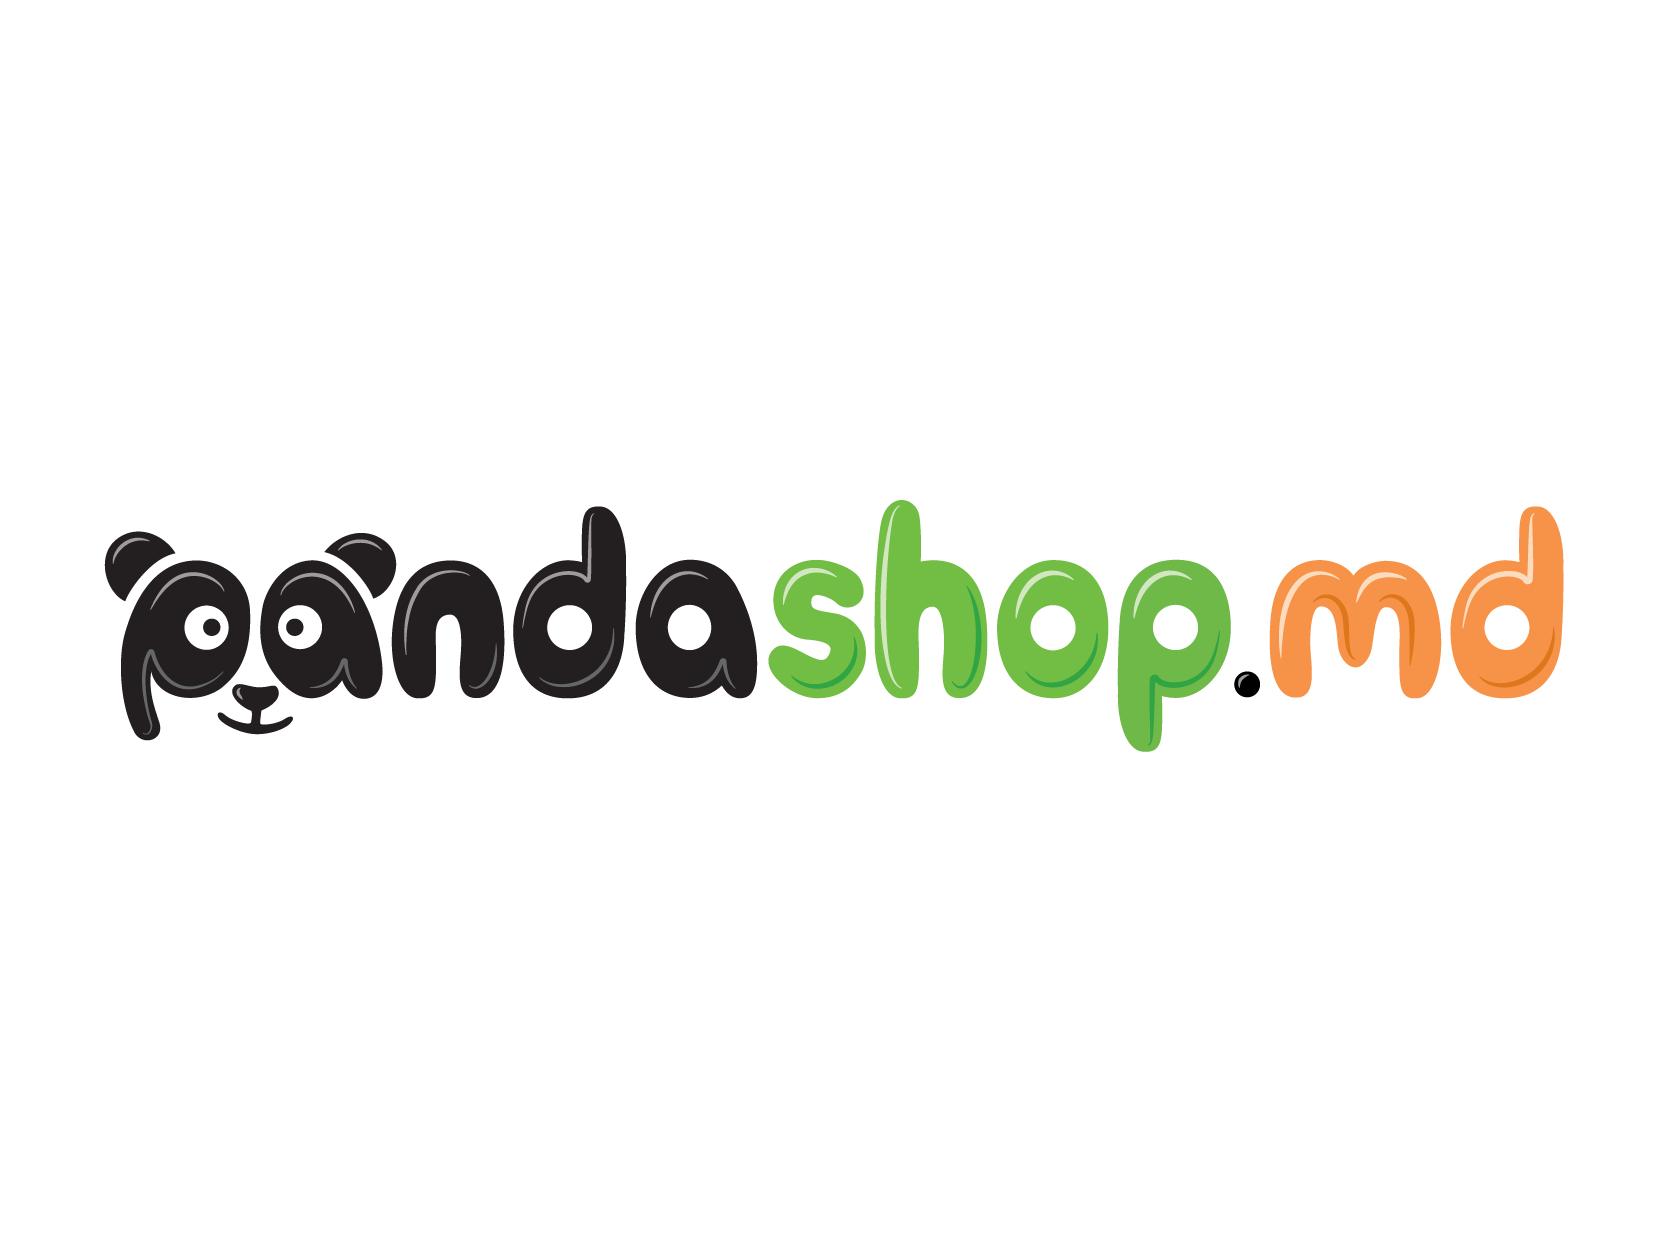 PandaShop.md